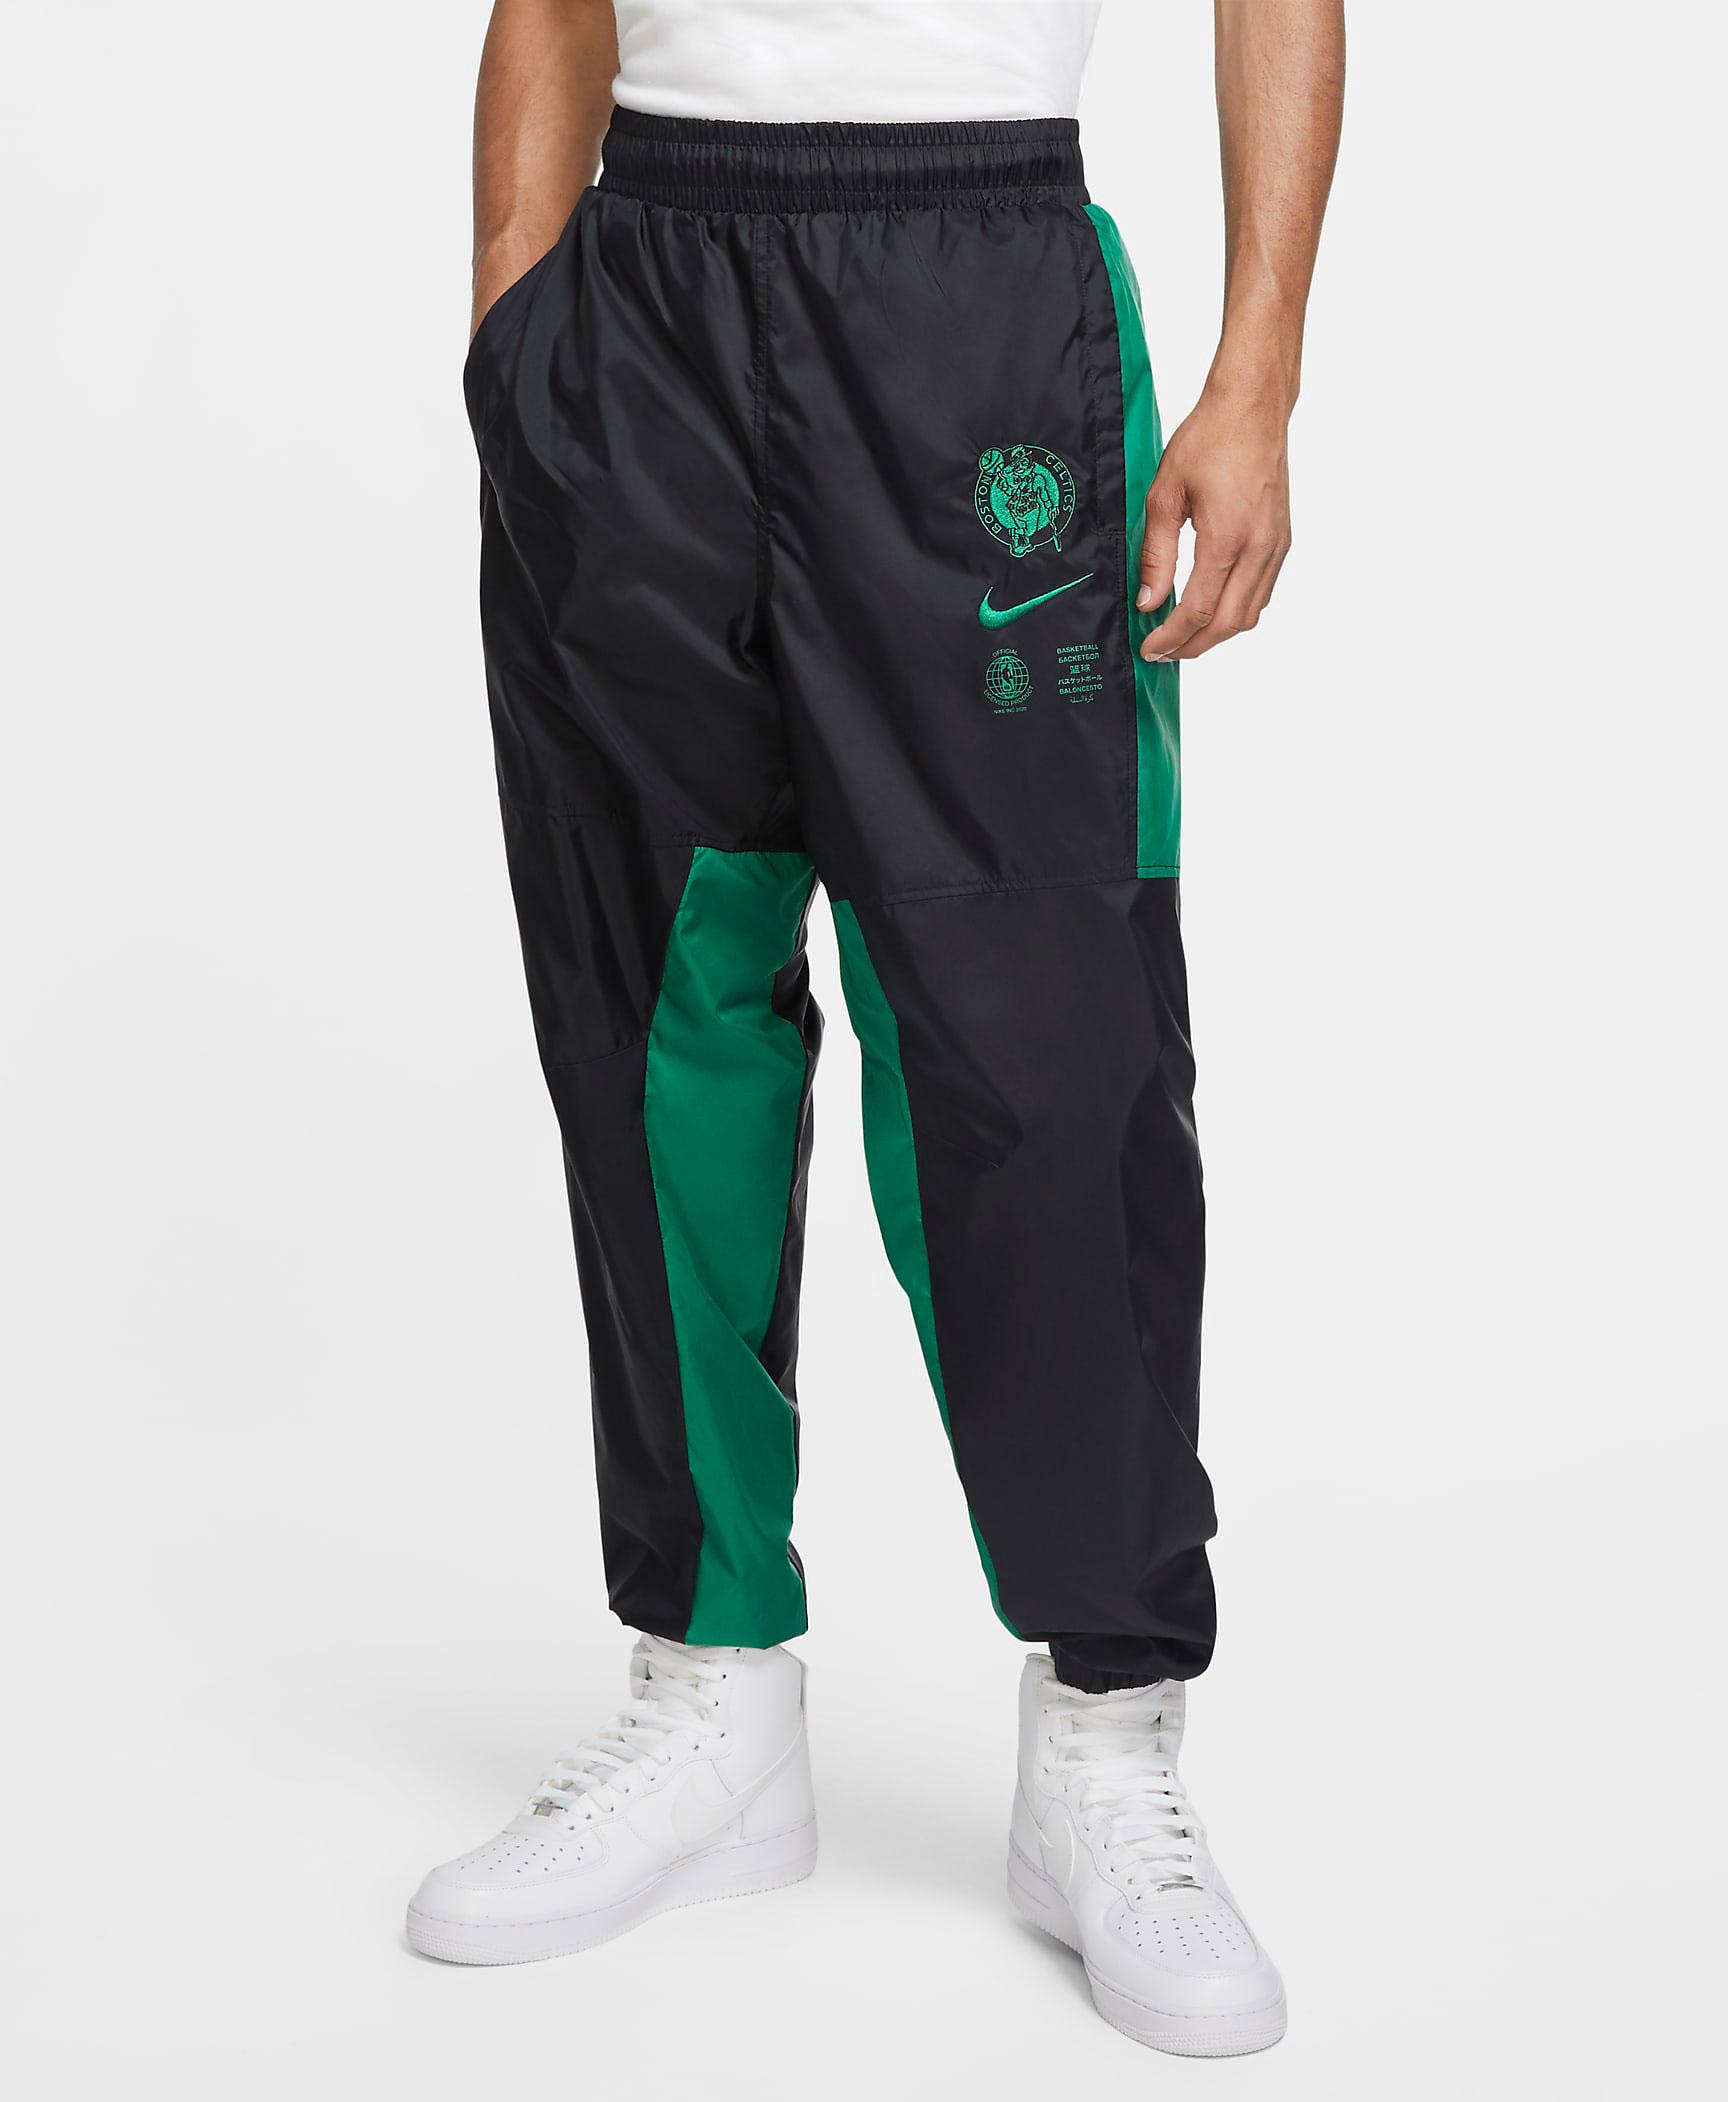 boston-celtics-nike-courtside-pants-1